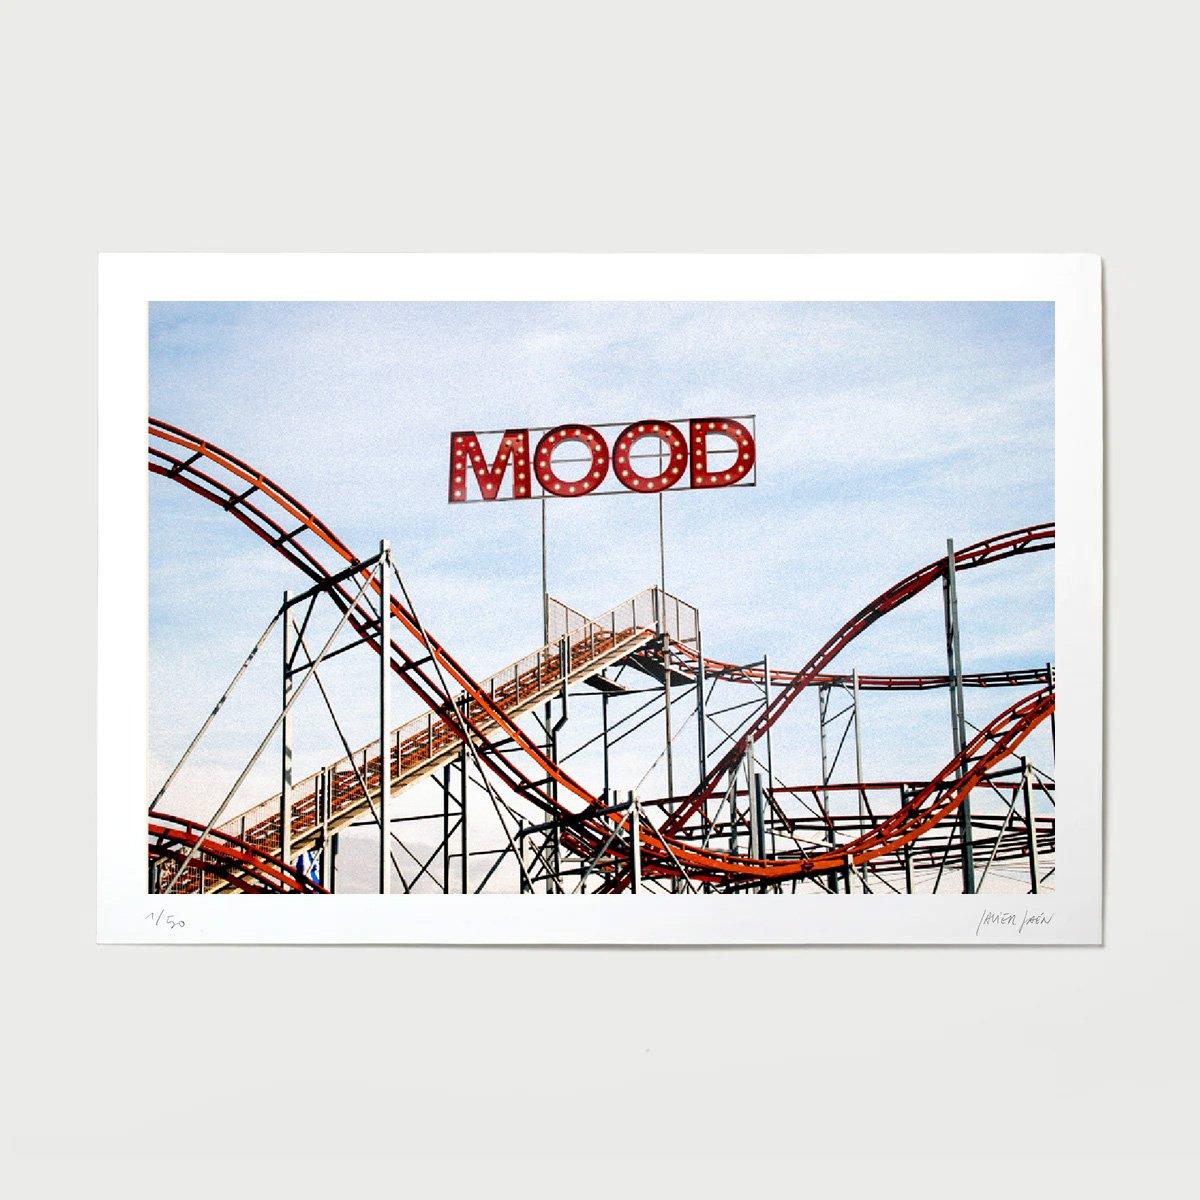 Image of Mood